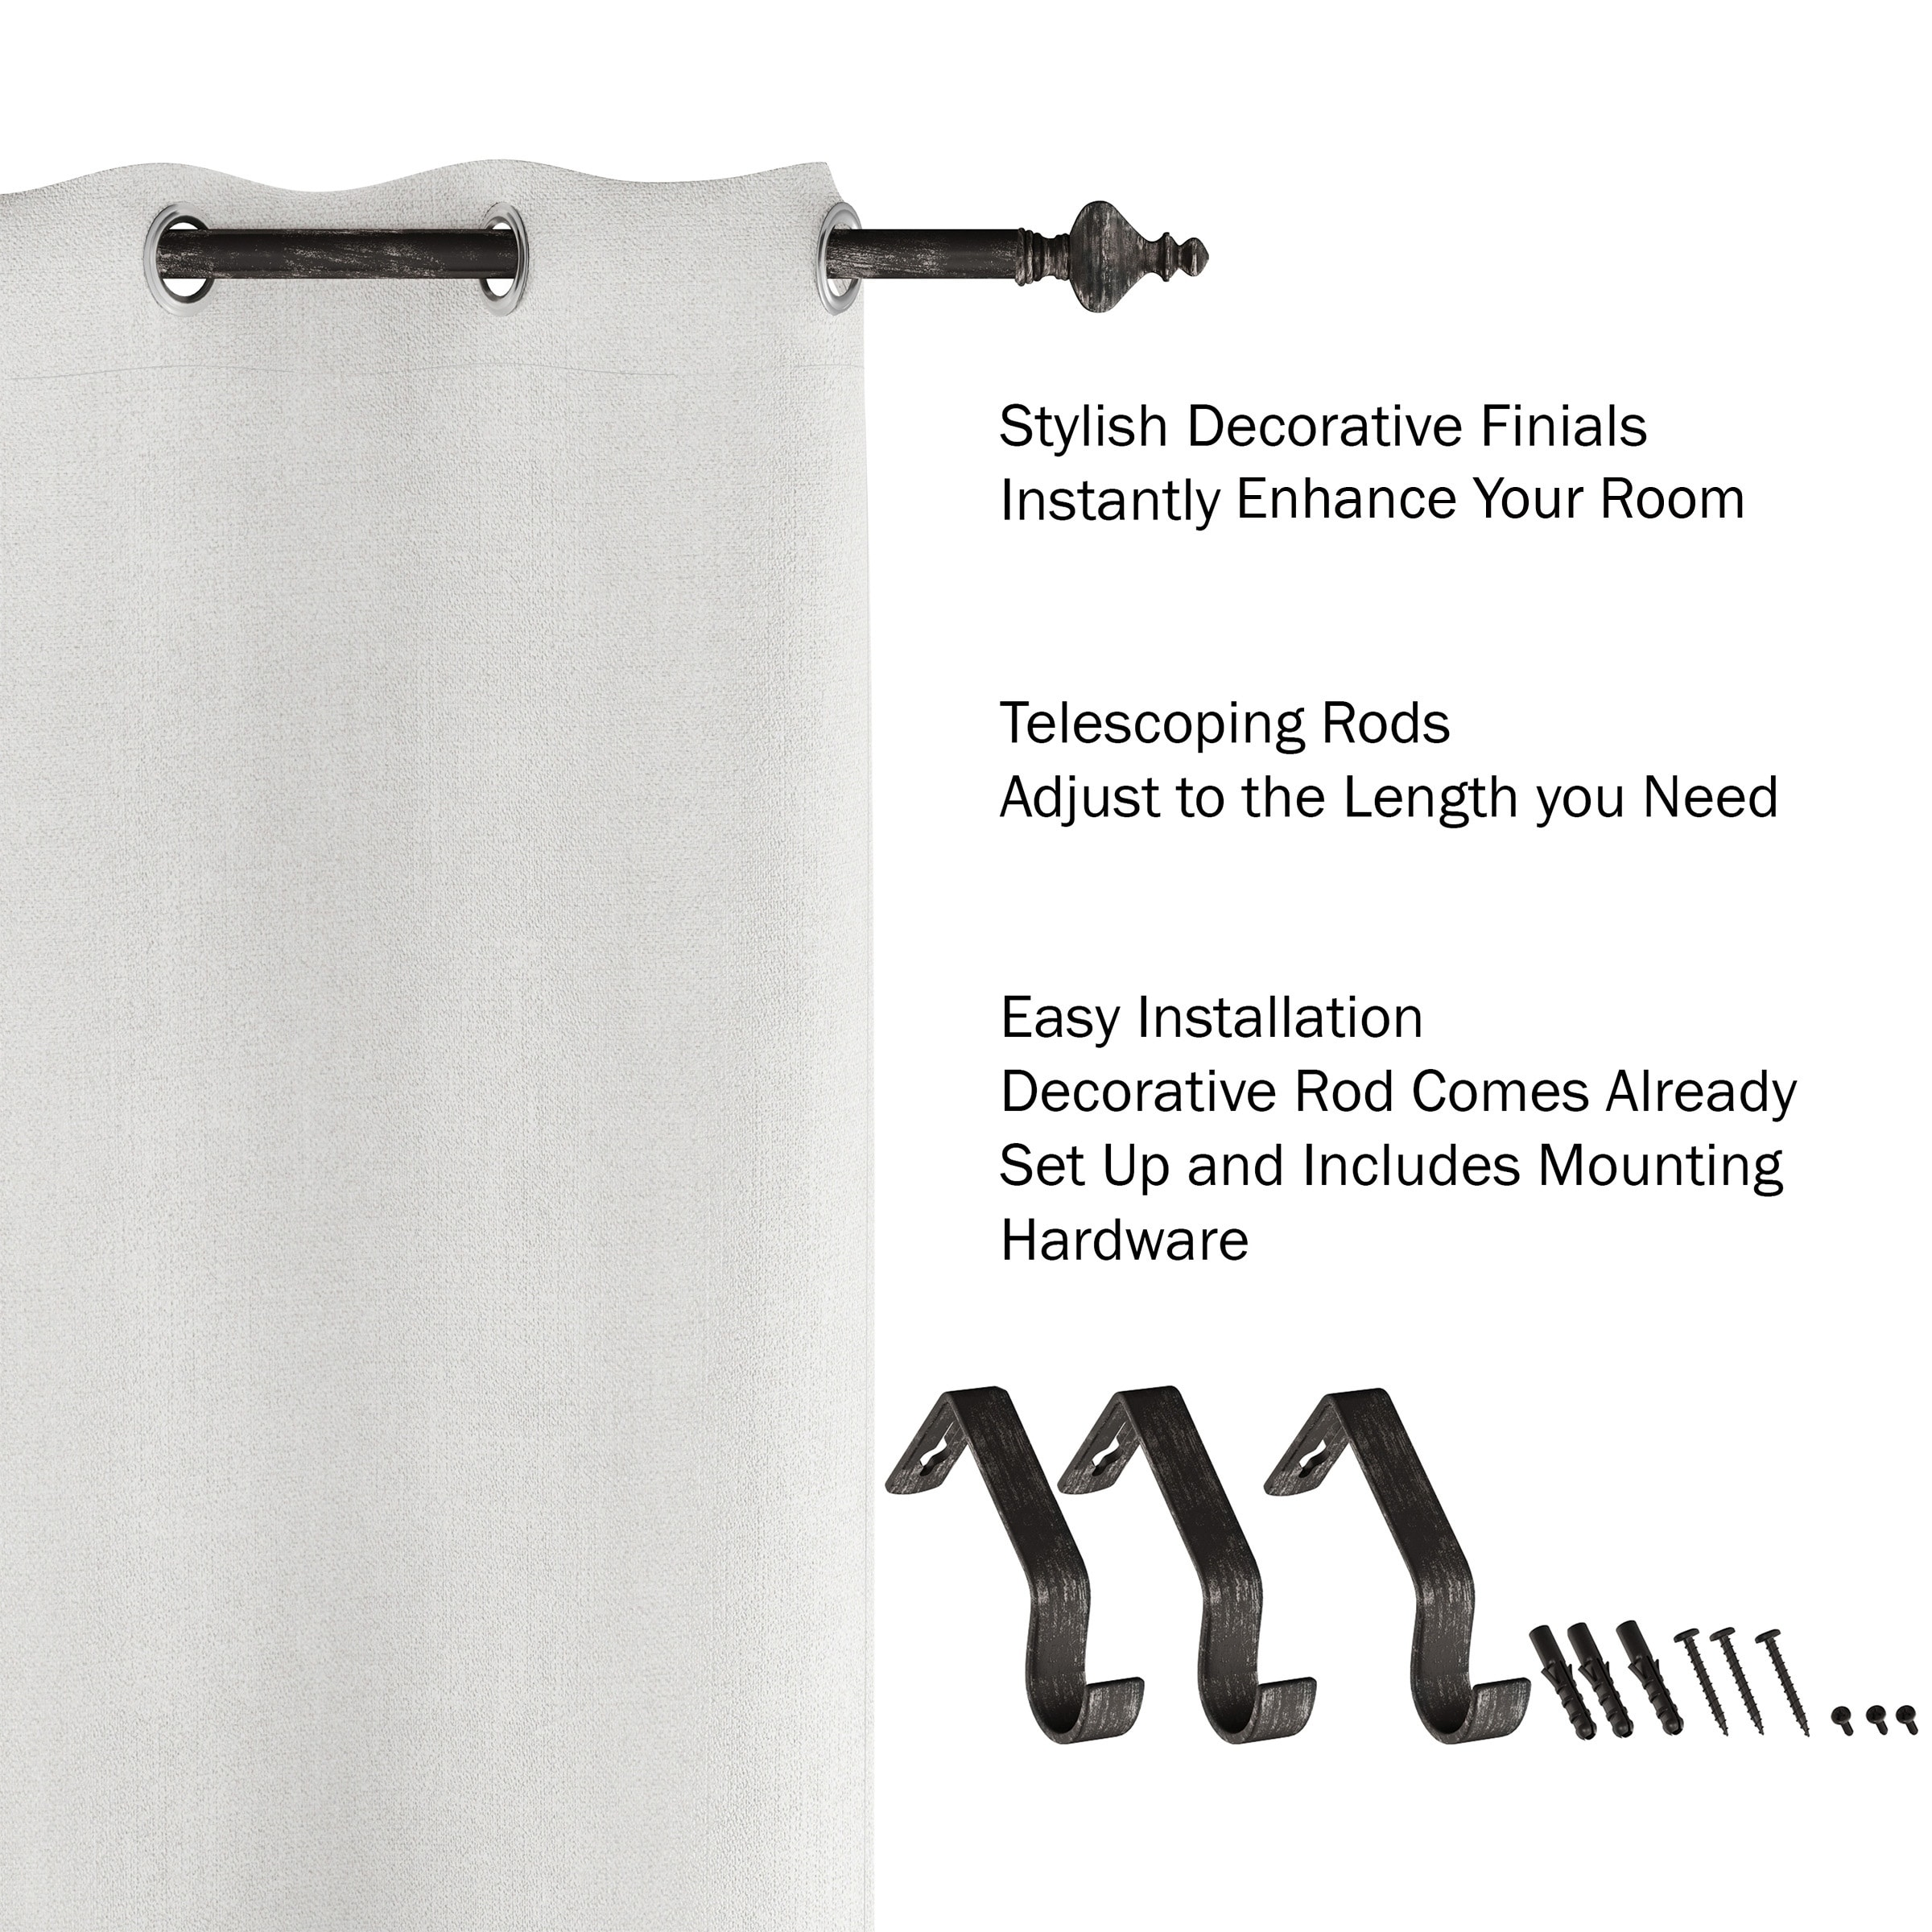 Distressed White Lavish Home 1-Inch Curtain Rod